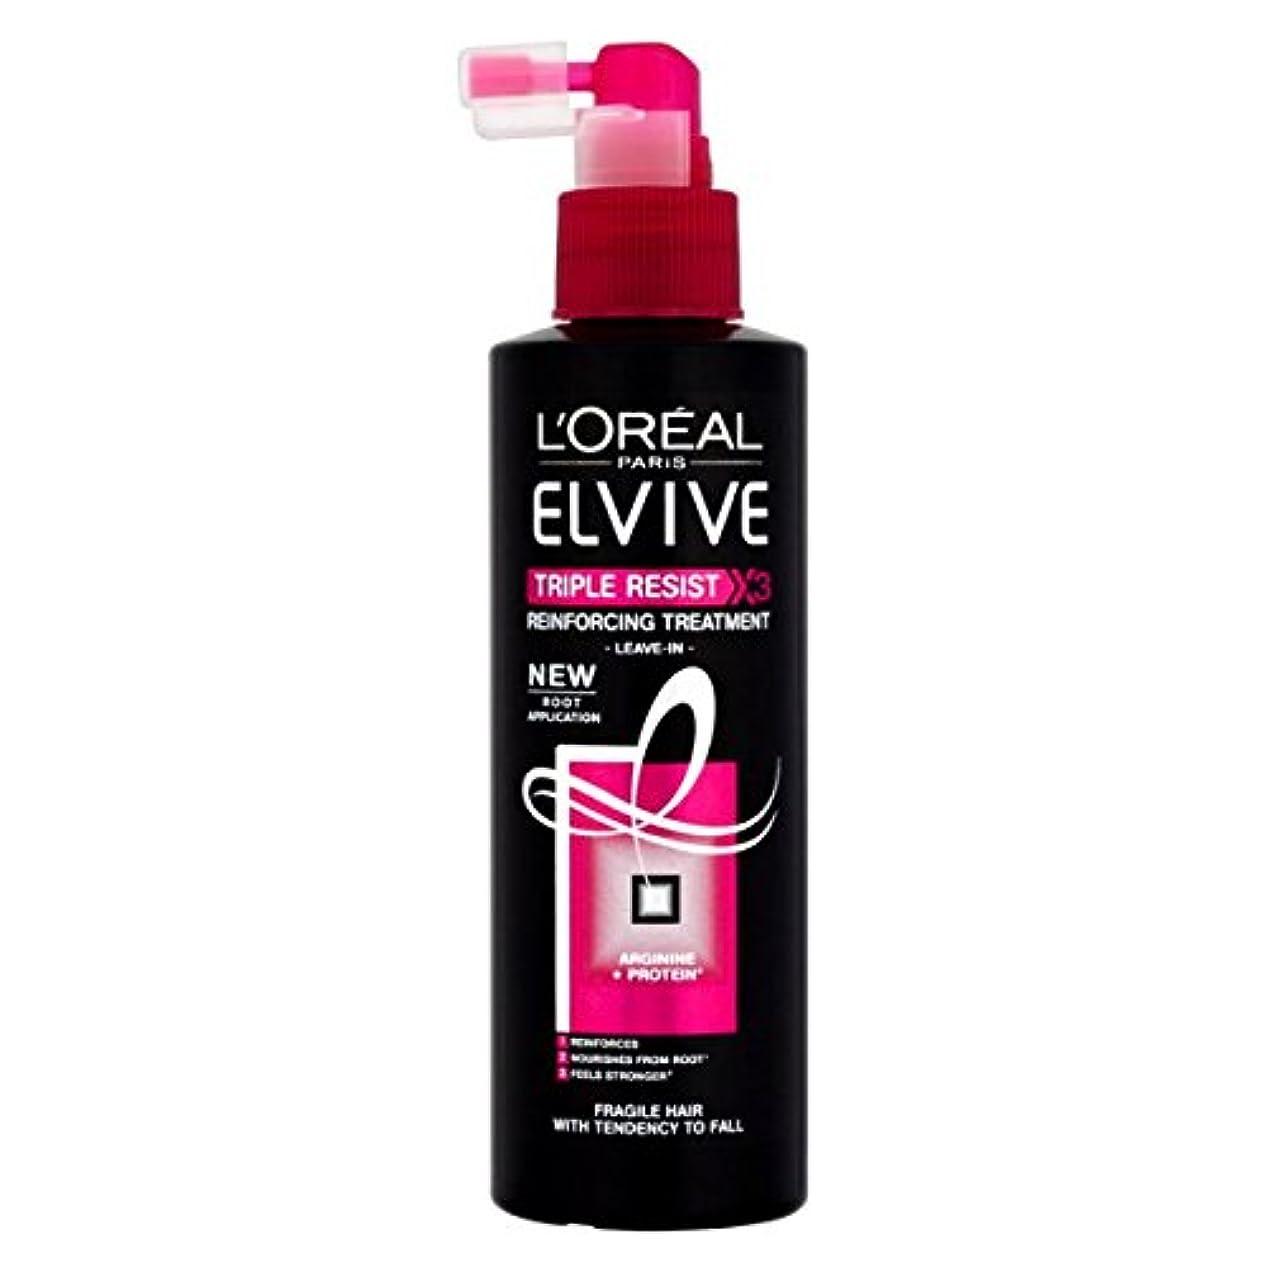 ハブブ厚さ合金L 'Oréal Paris Elvive Triple Resist Leave-In verstärkendem Treatment 200 ml